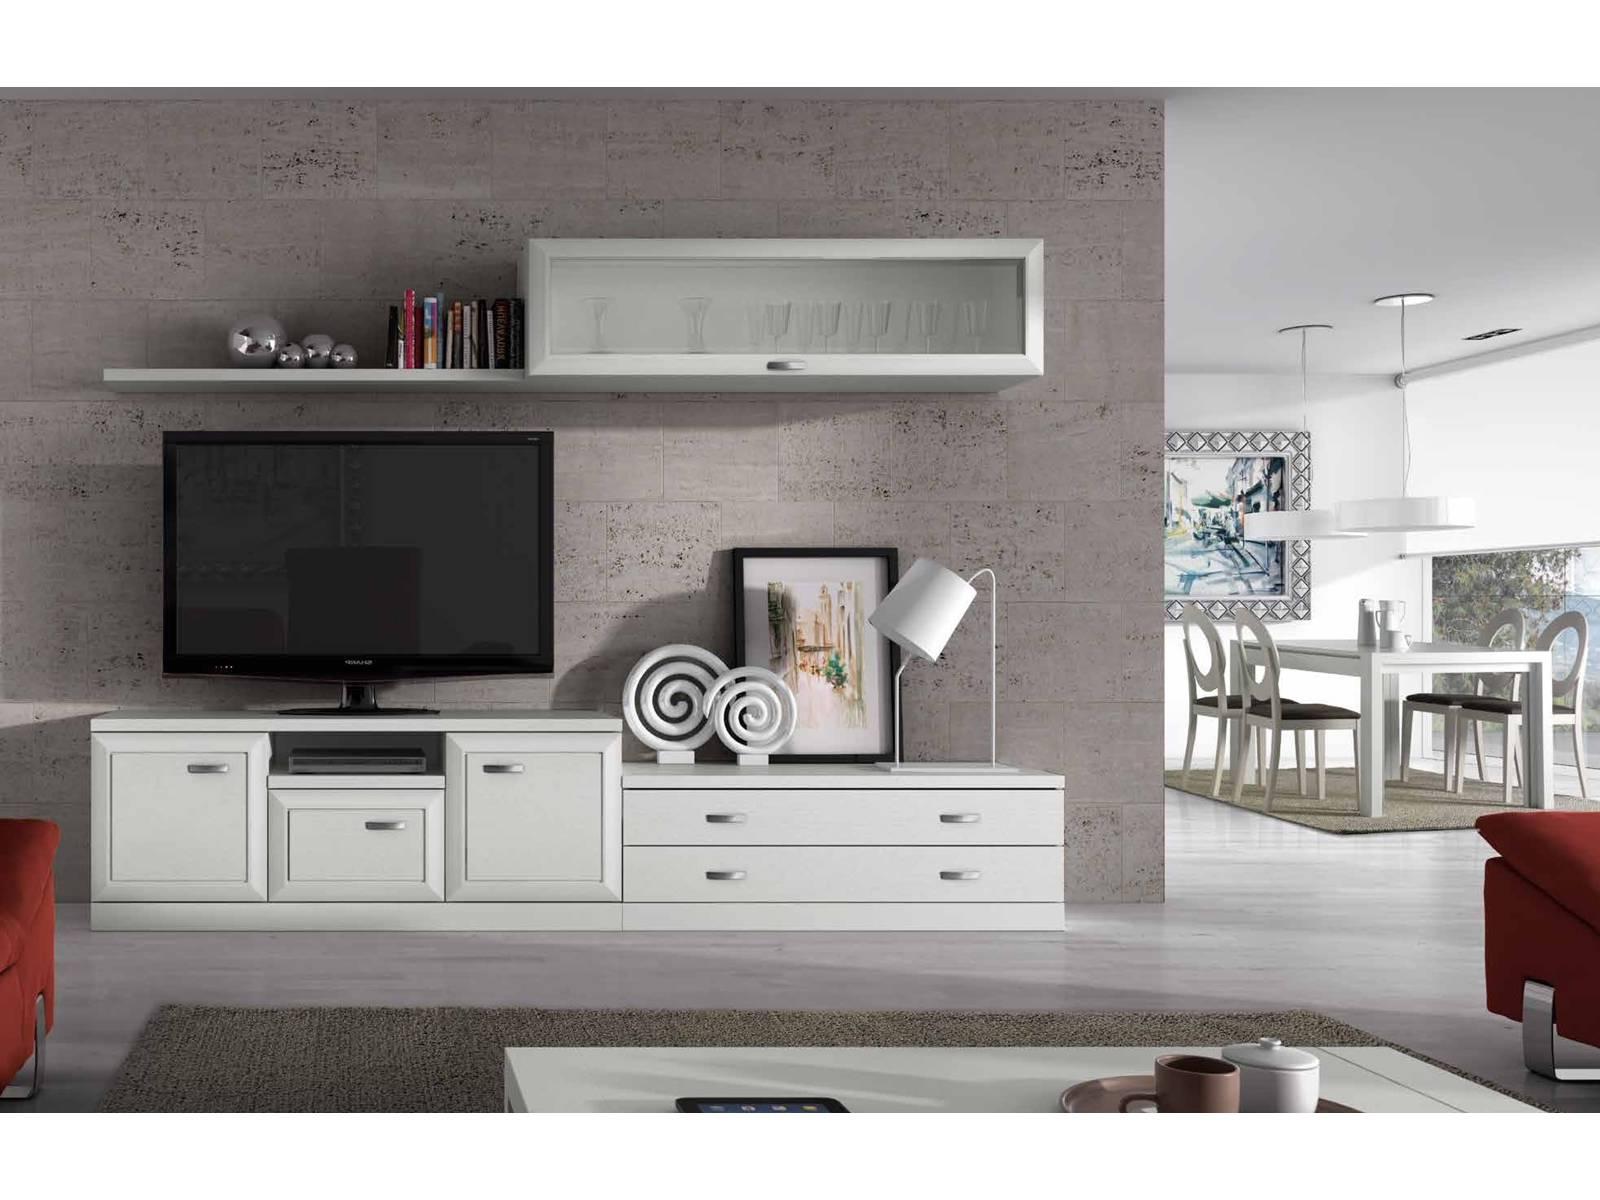 Muebles De Salon Modulares T8dj Mueble De Salà N Modular Blanco